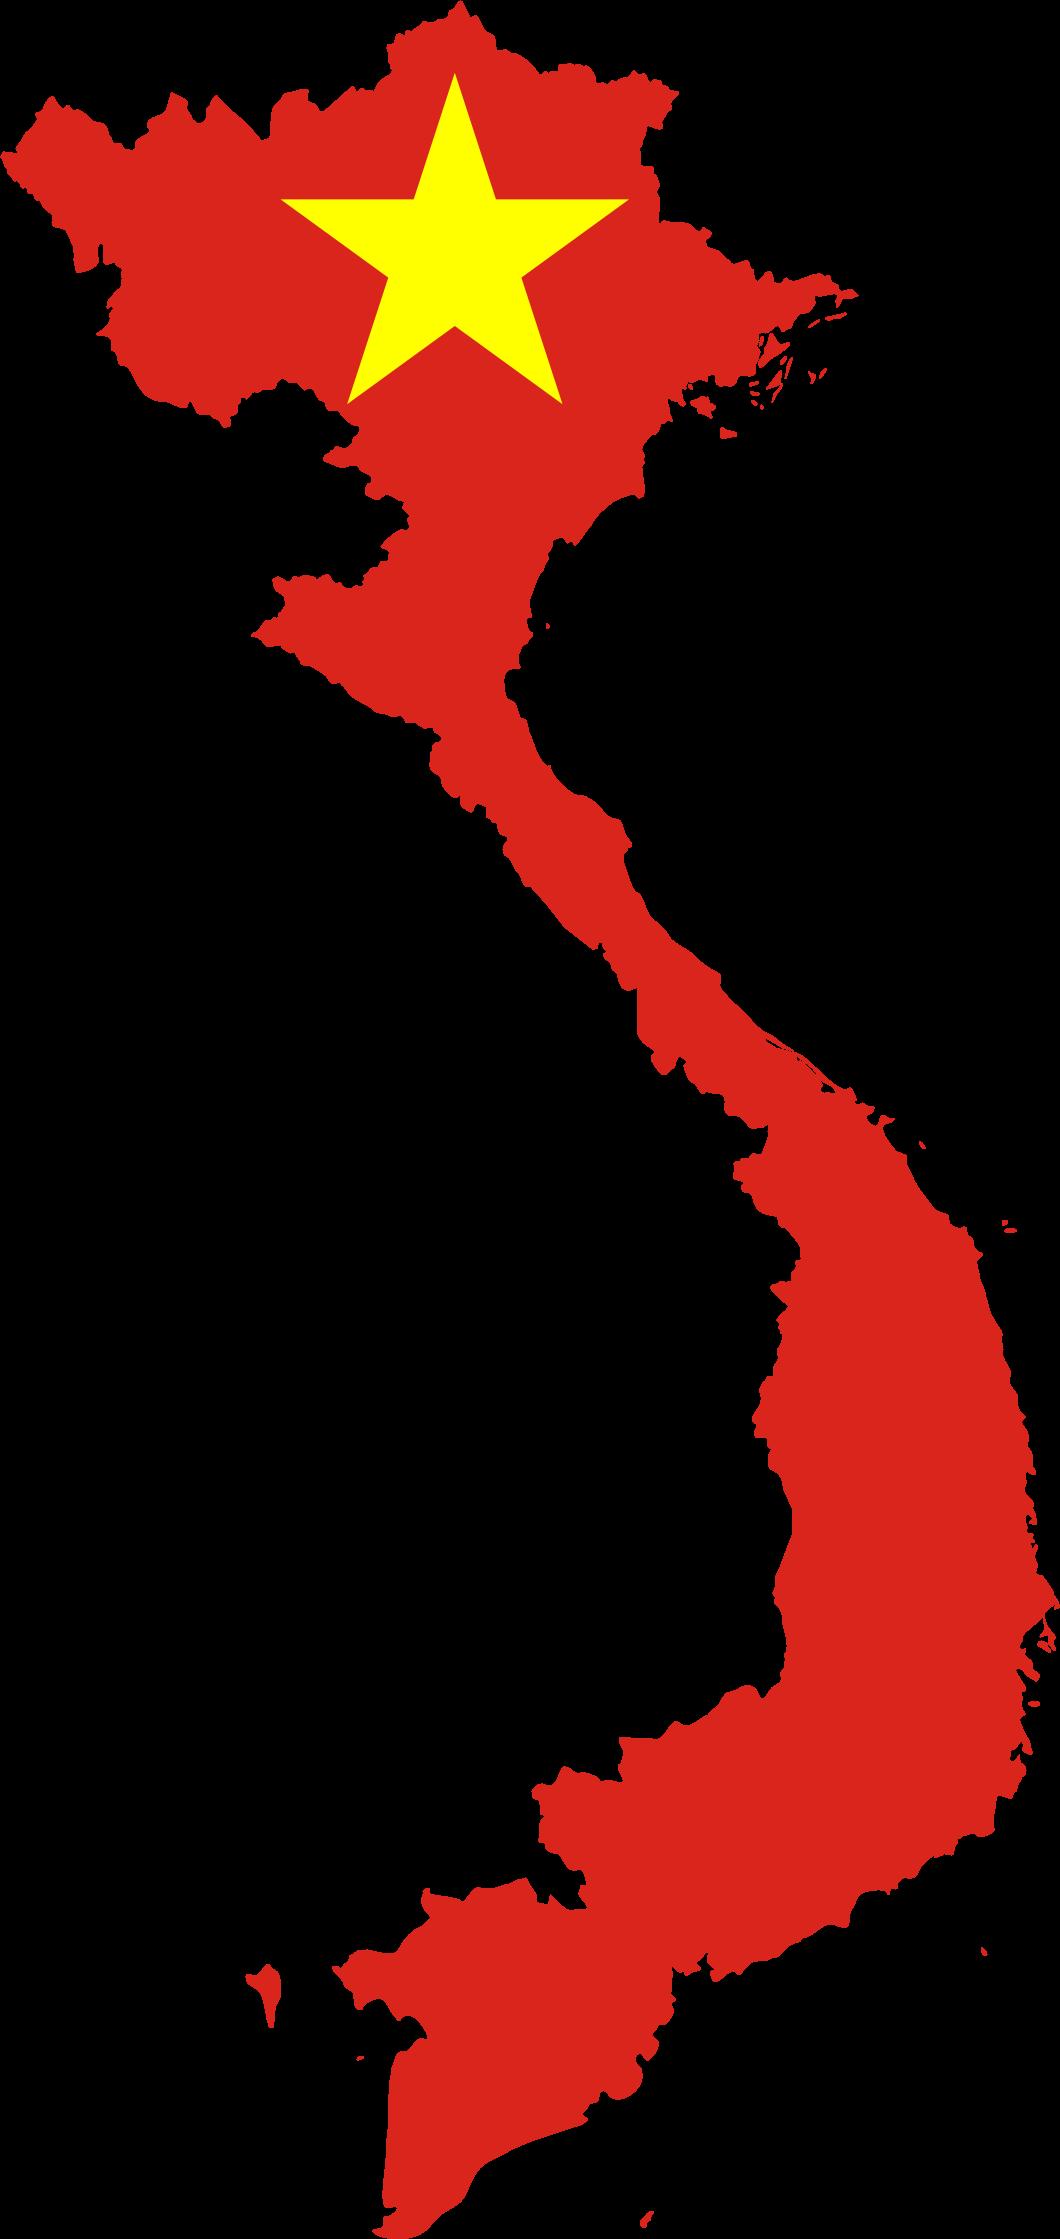 Clipart Vietnam Map Flag - Vietnam map outline